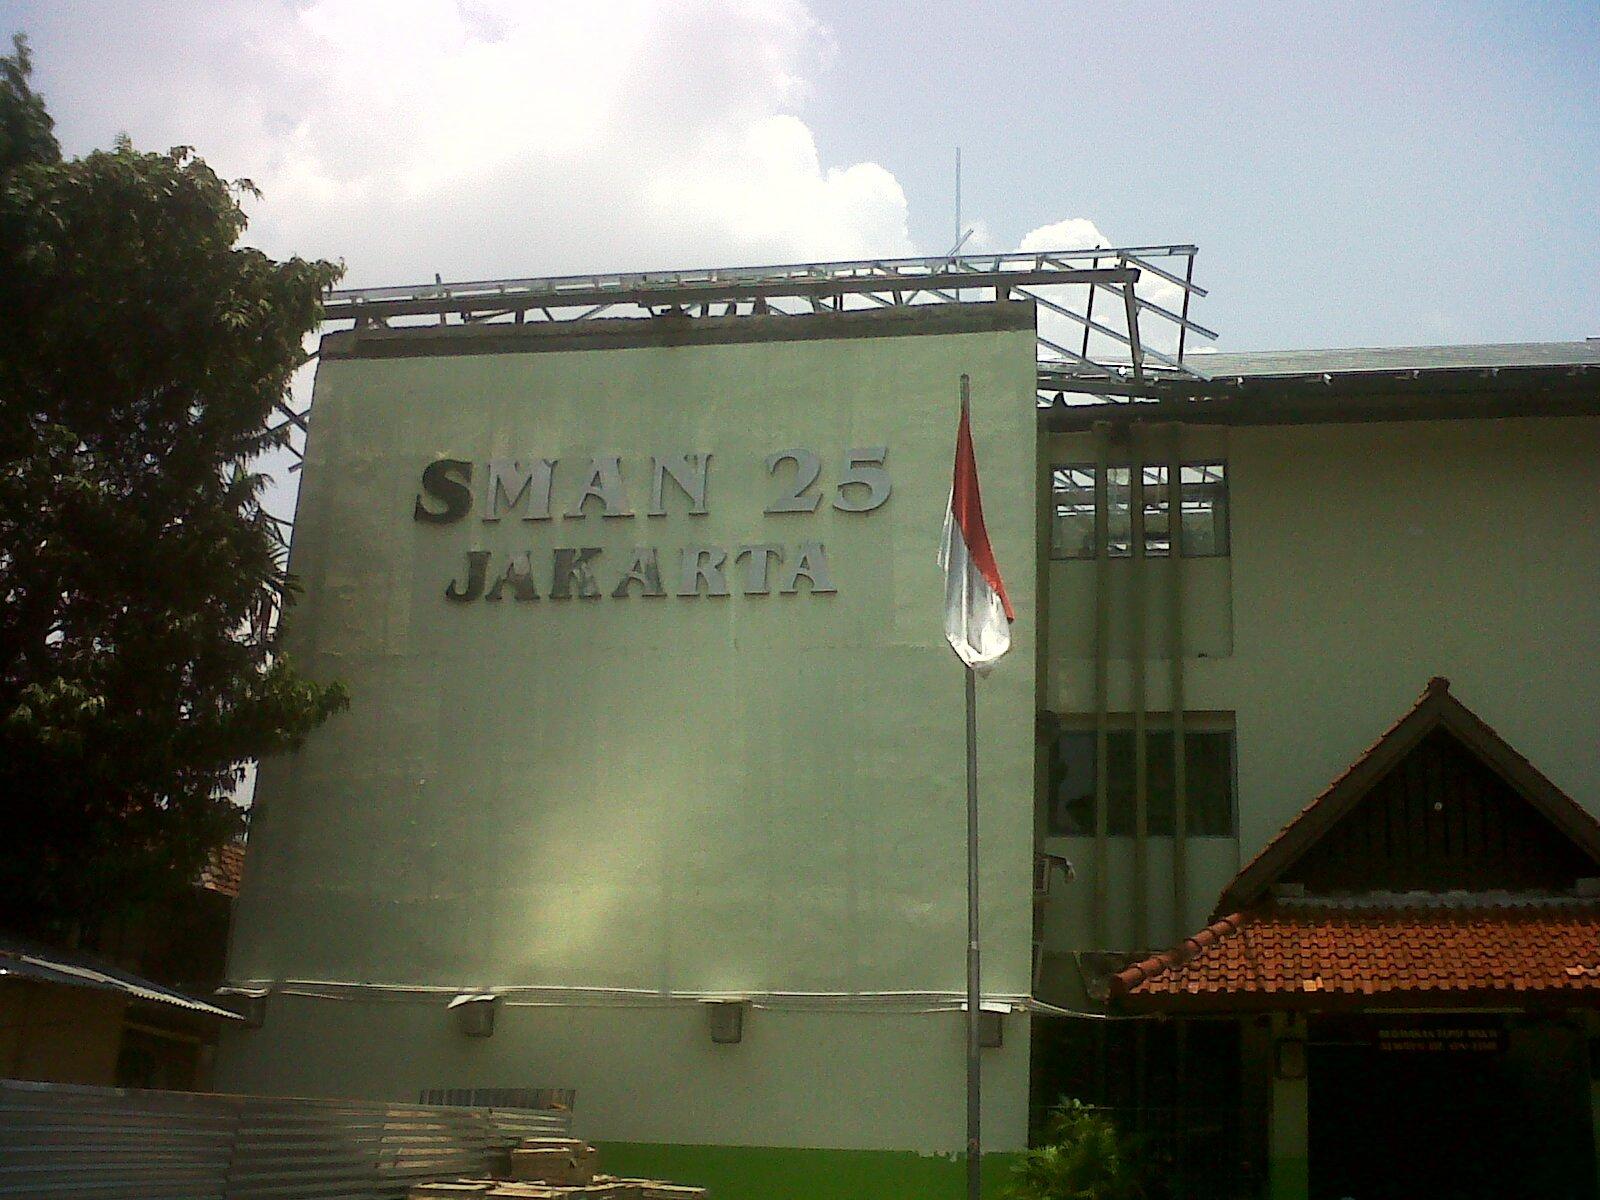 sma-n-25-1